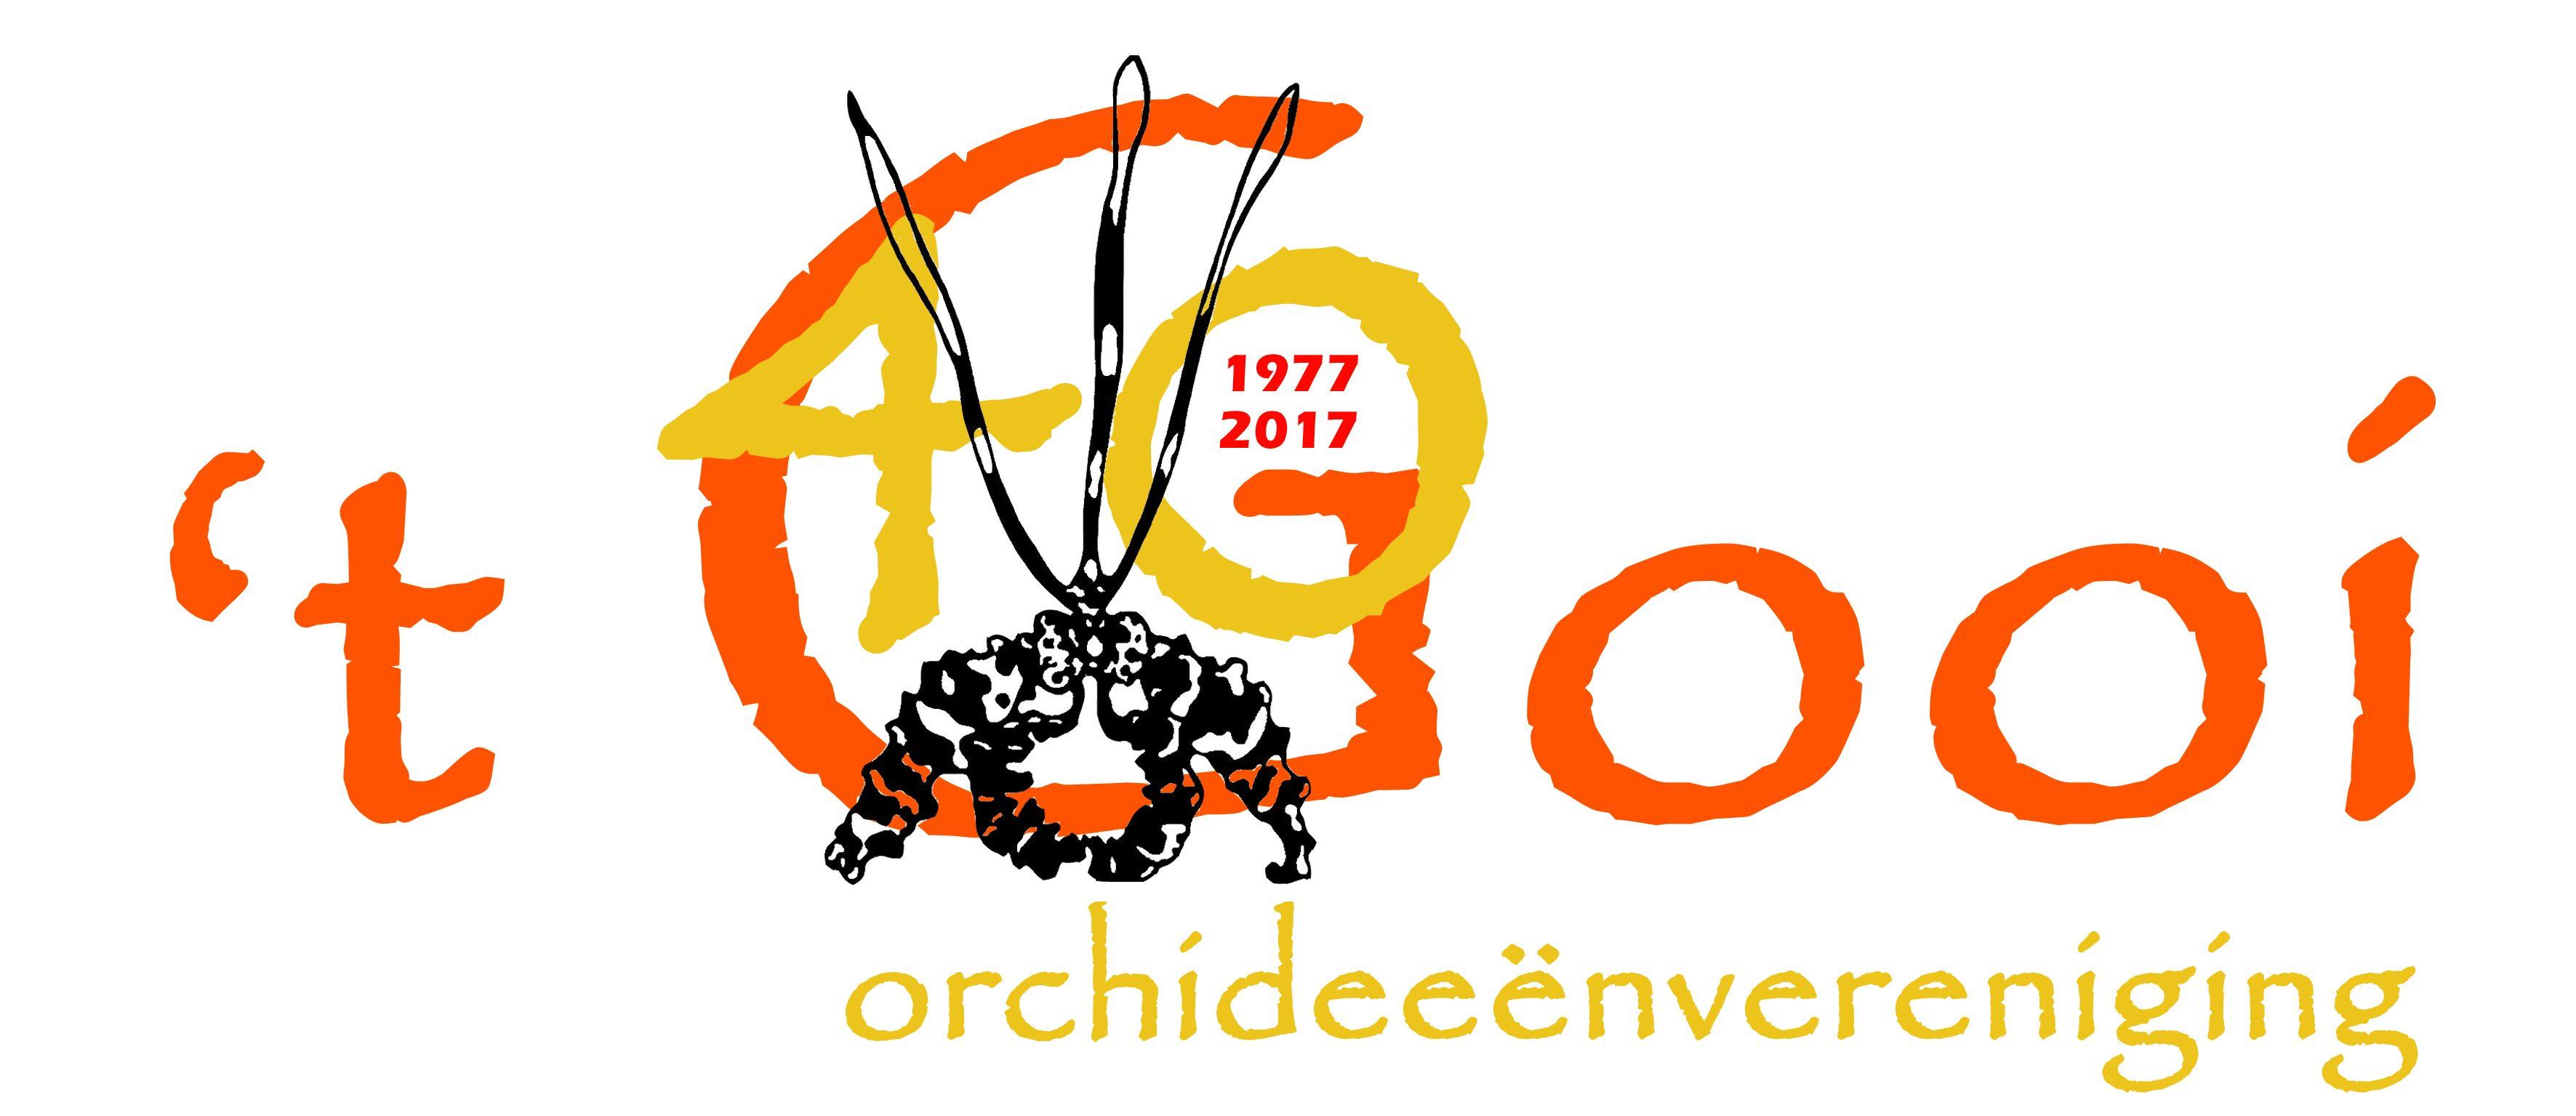 40 jaar Orchideeën Vereniging 't Gooi !!!